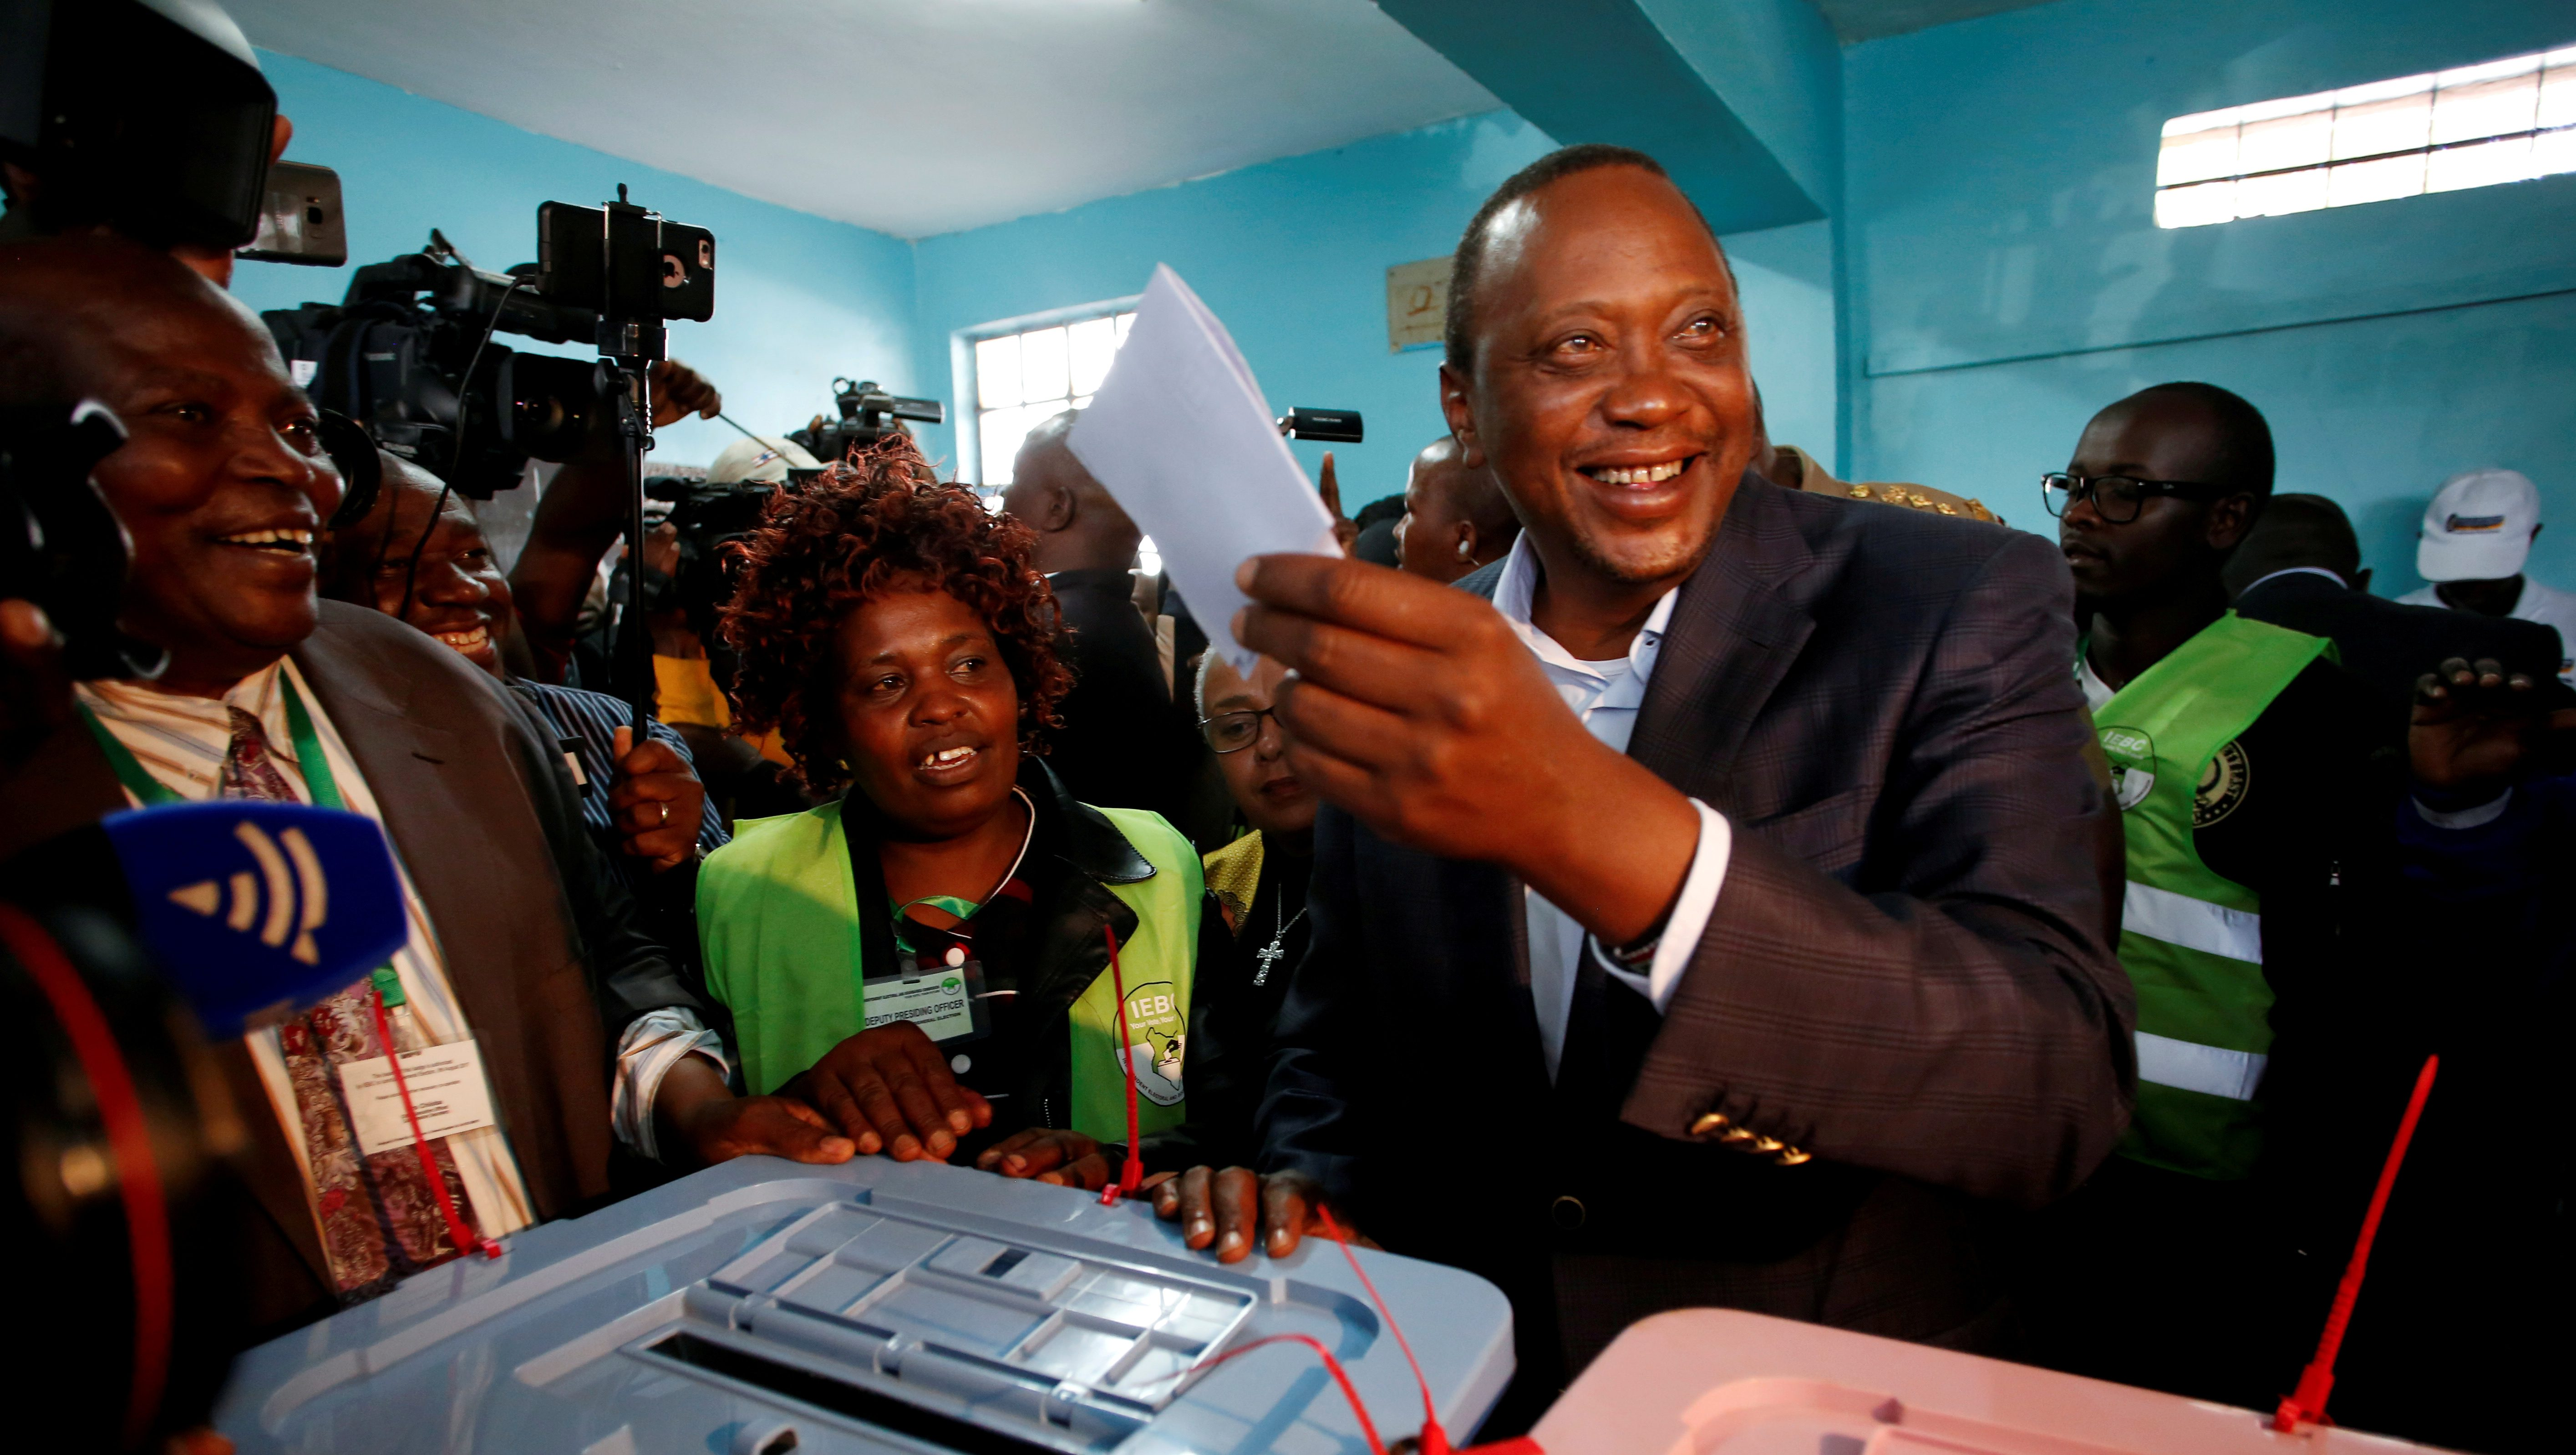 FILE PHOTO: Kenya's President Uhuru Kenyatta casts his ballot inside a polling station in his hometown of Gatundu in Kiambu county, Kenya August 8, 2017.    To match Special Report KENYA-POLICE/WATCHDOG